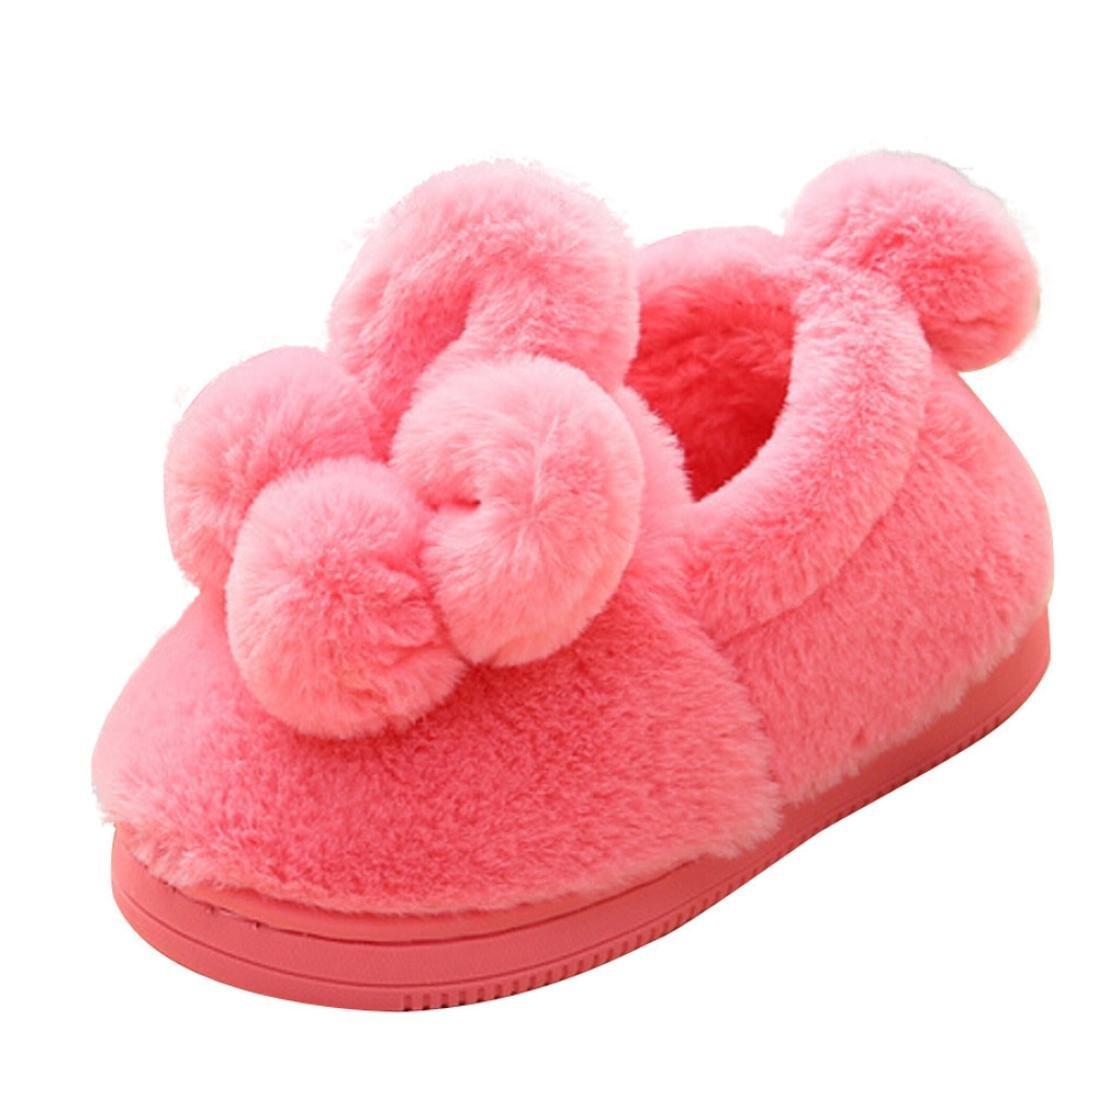 Newborn Baby Girl Soft Sole Crib Shoes Fluffy Fur Home Slippers Pram Sandals US